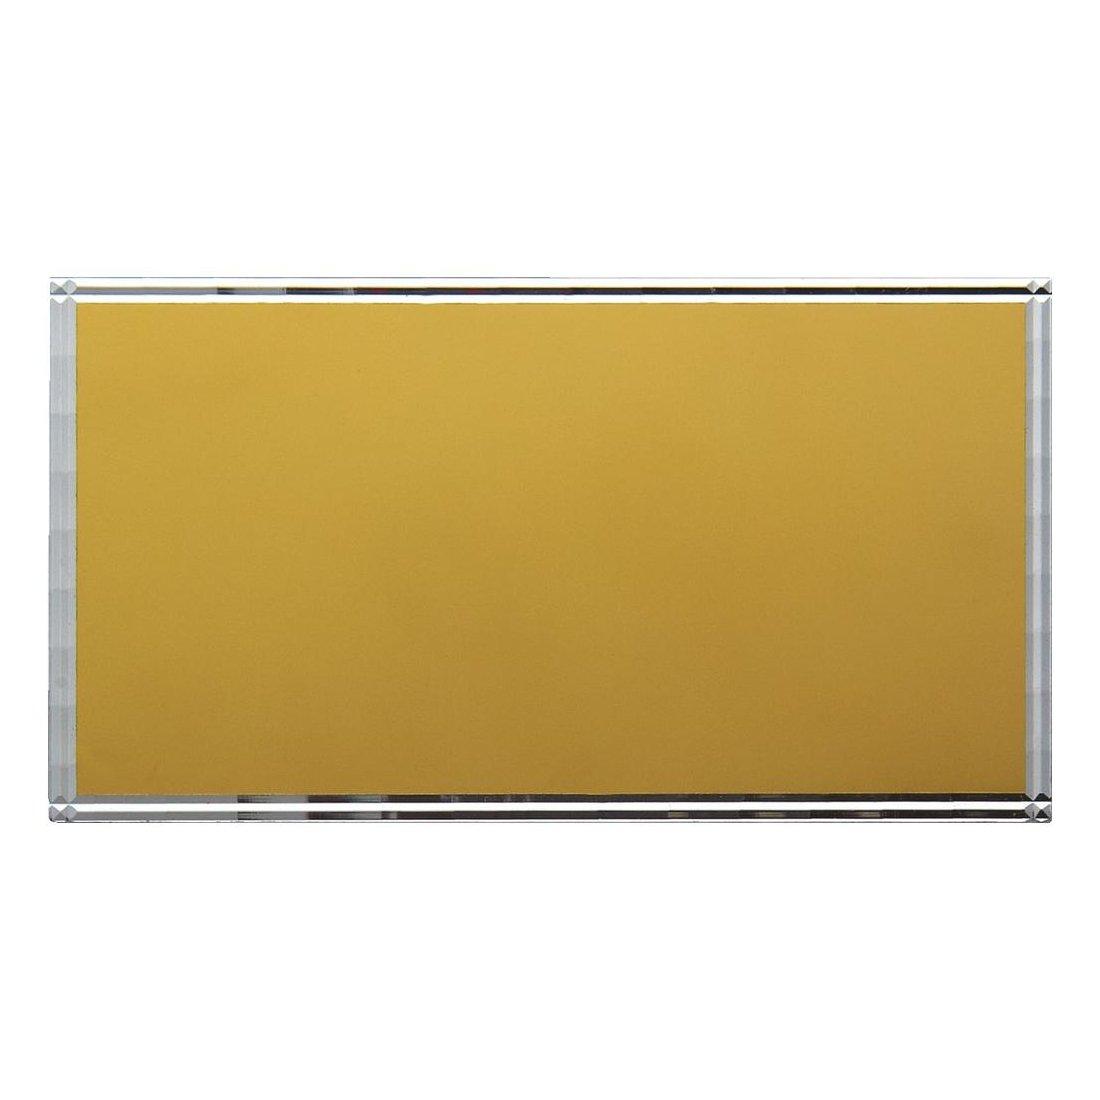 Diamond Edge Gilt Engraving Plate